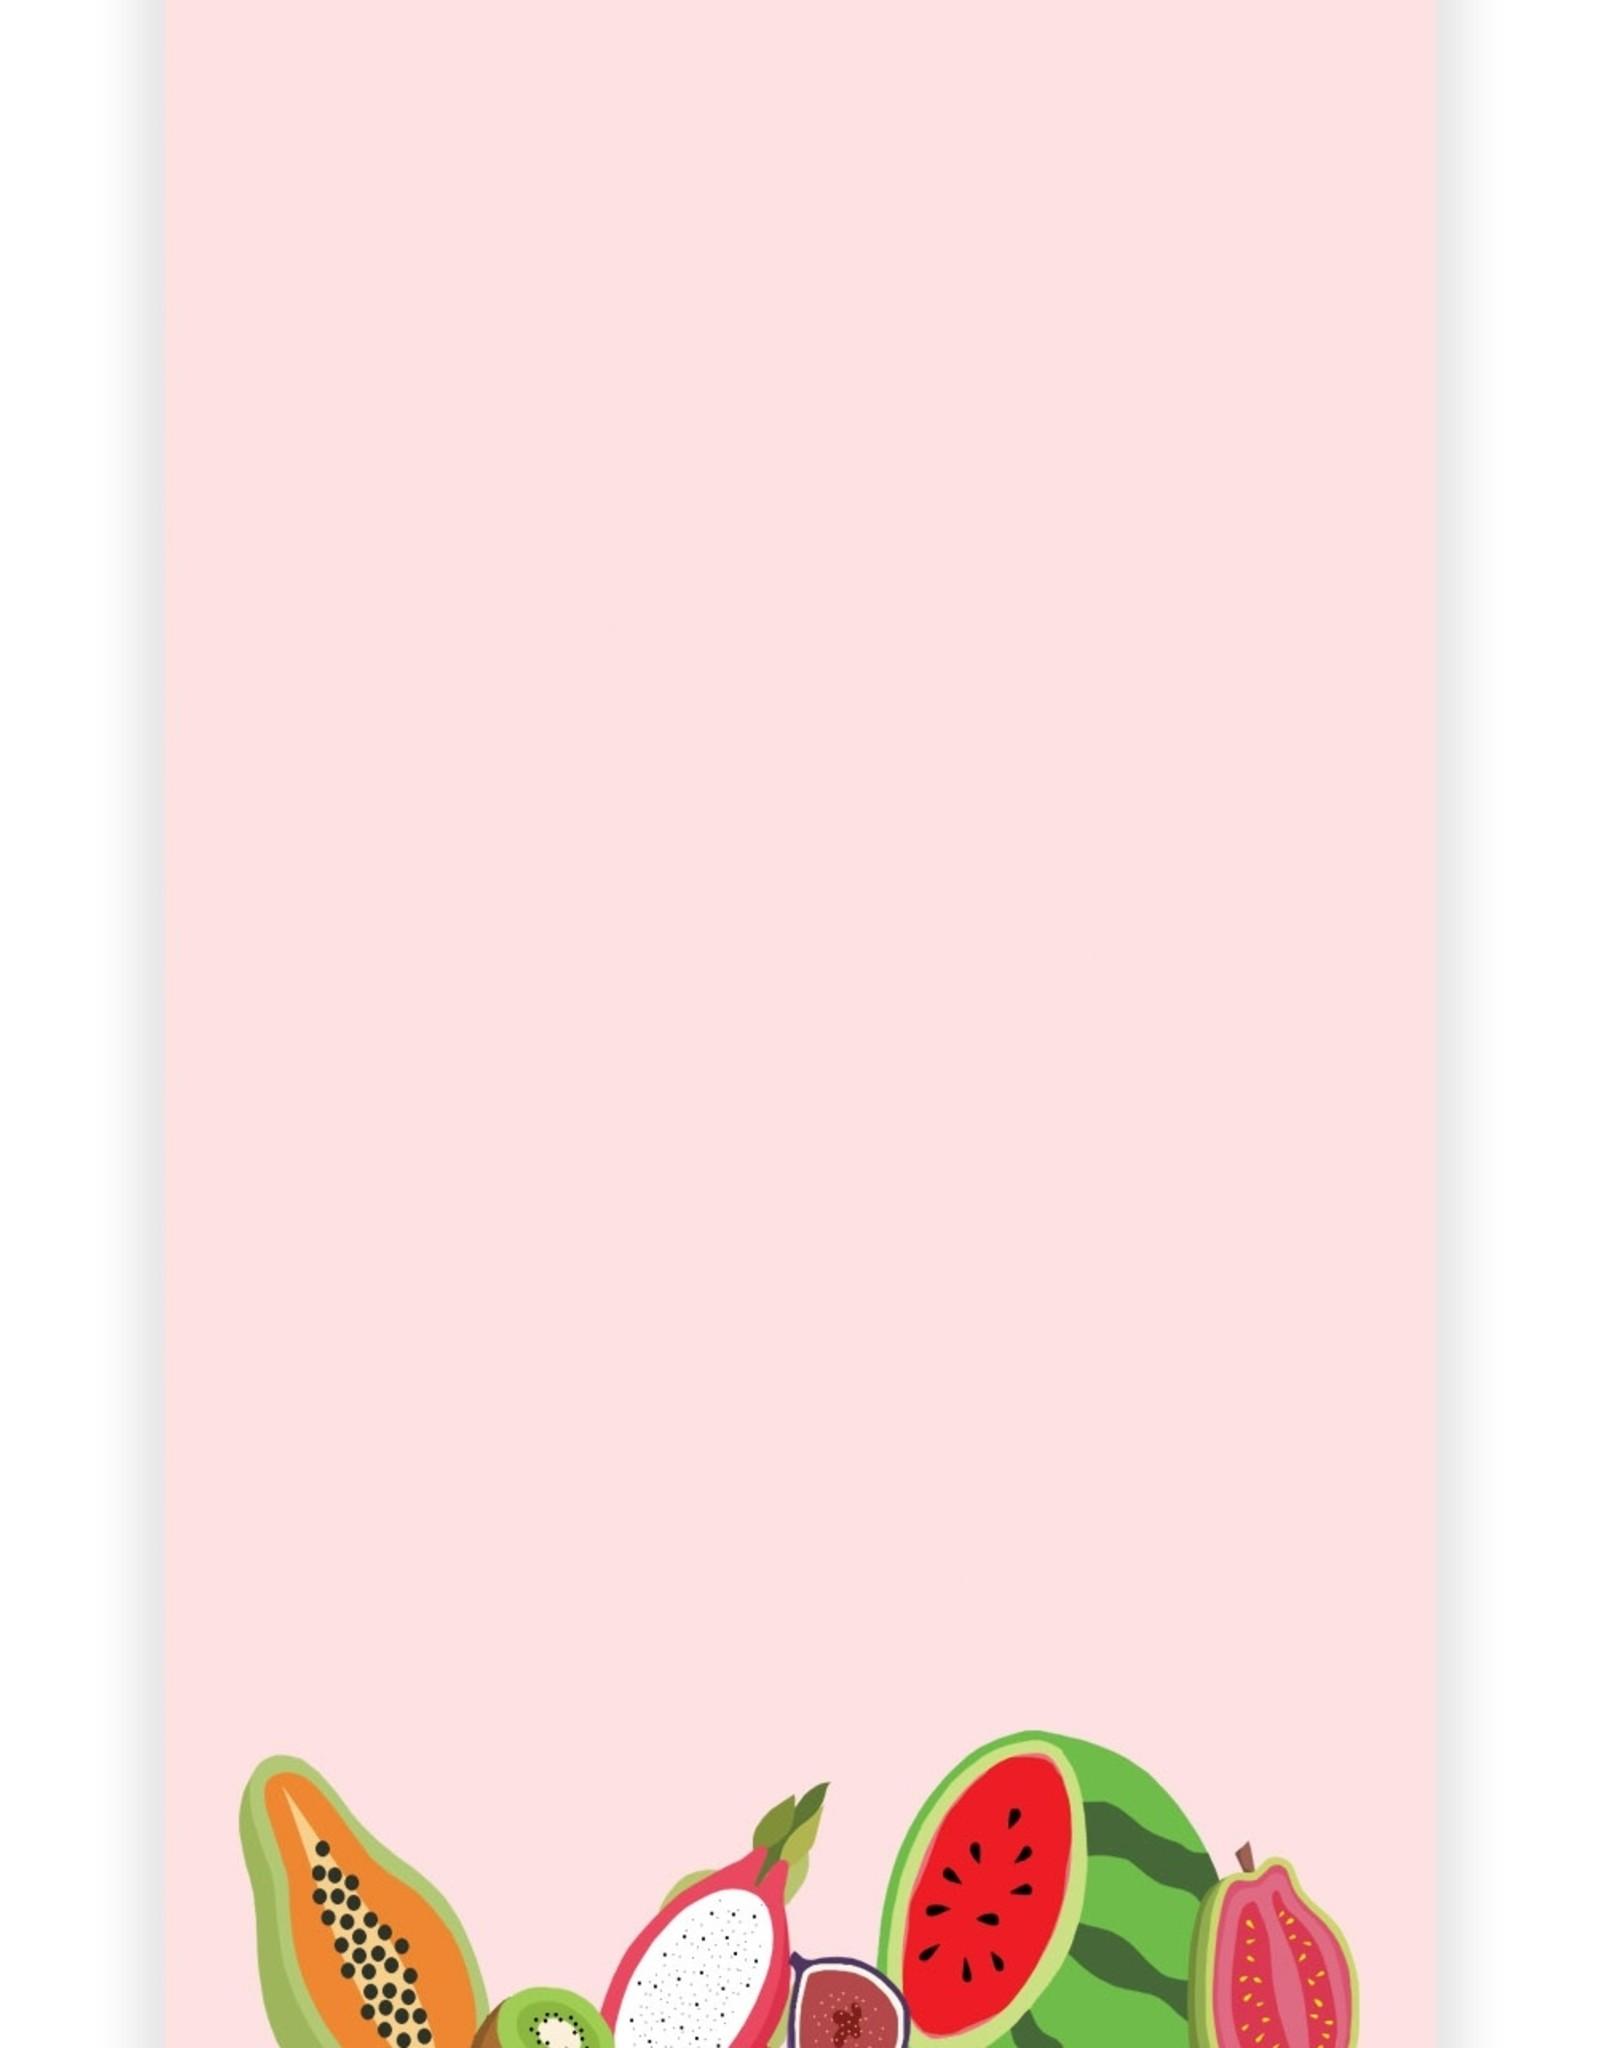 xou Notepad: Fruits